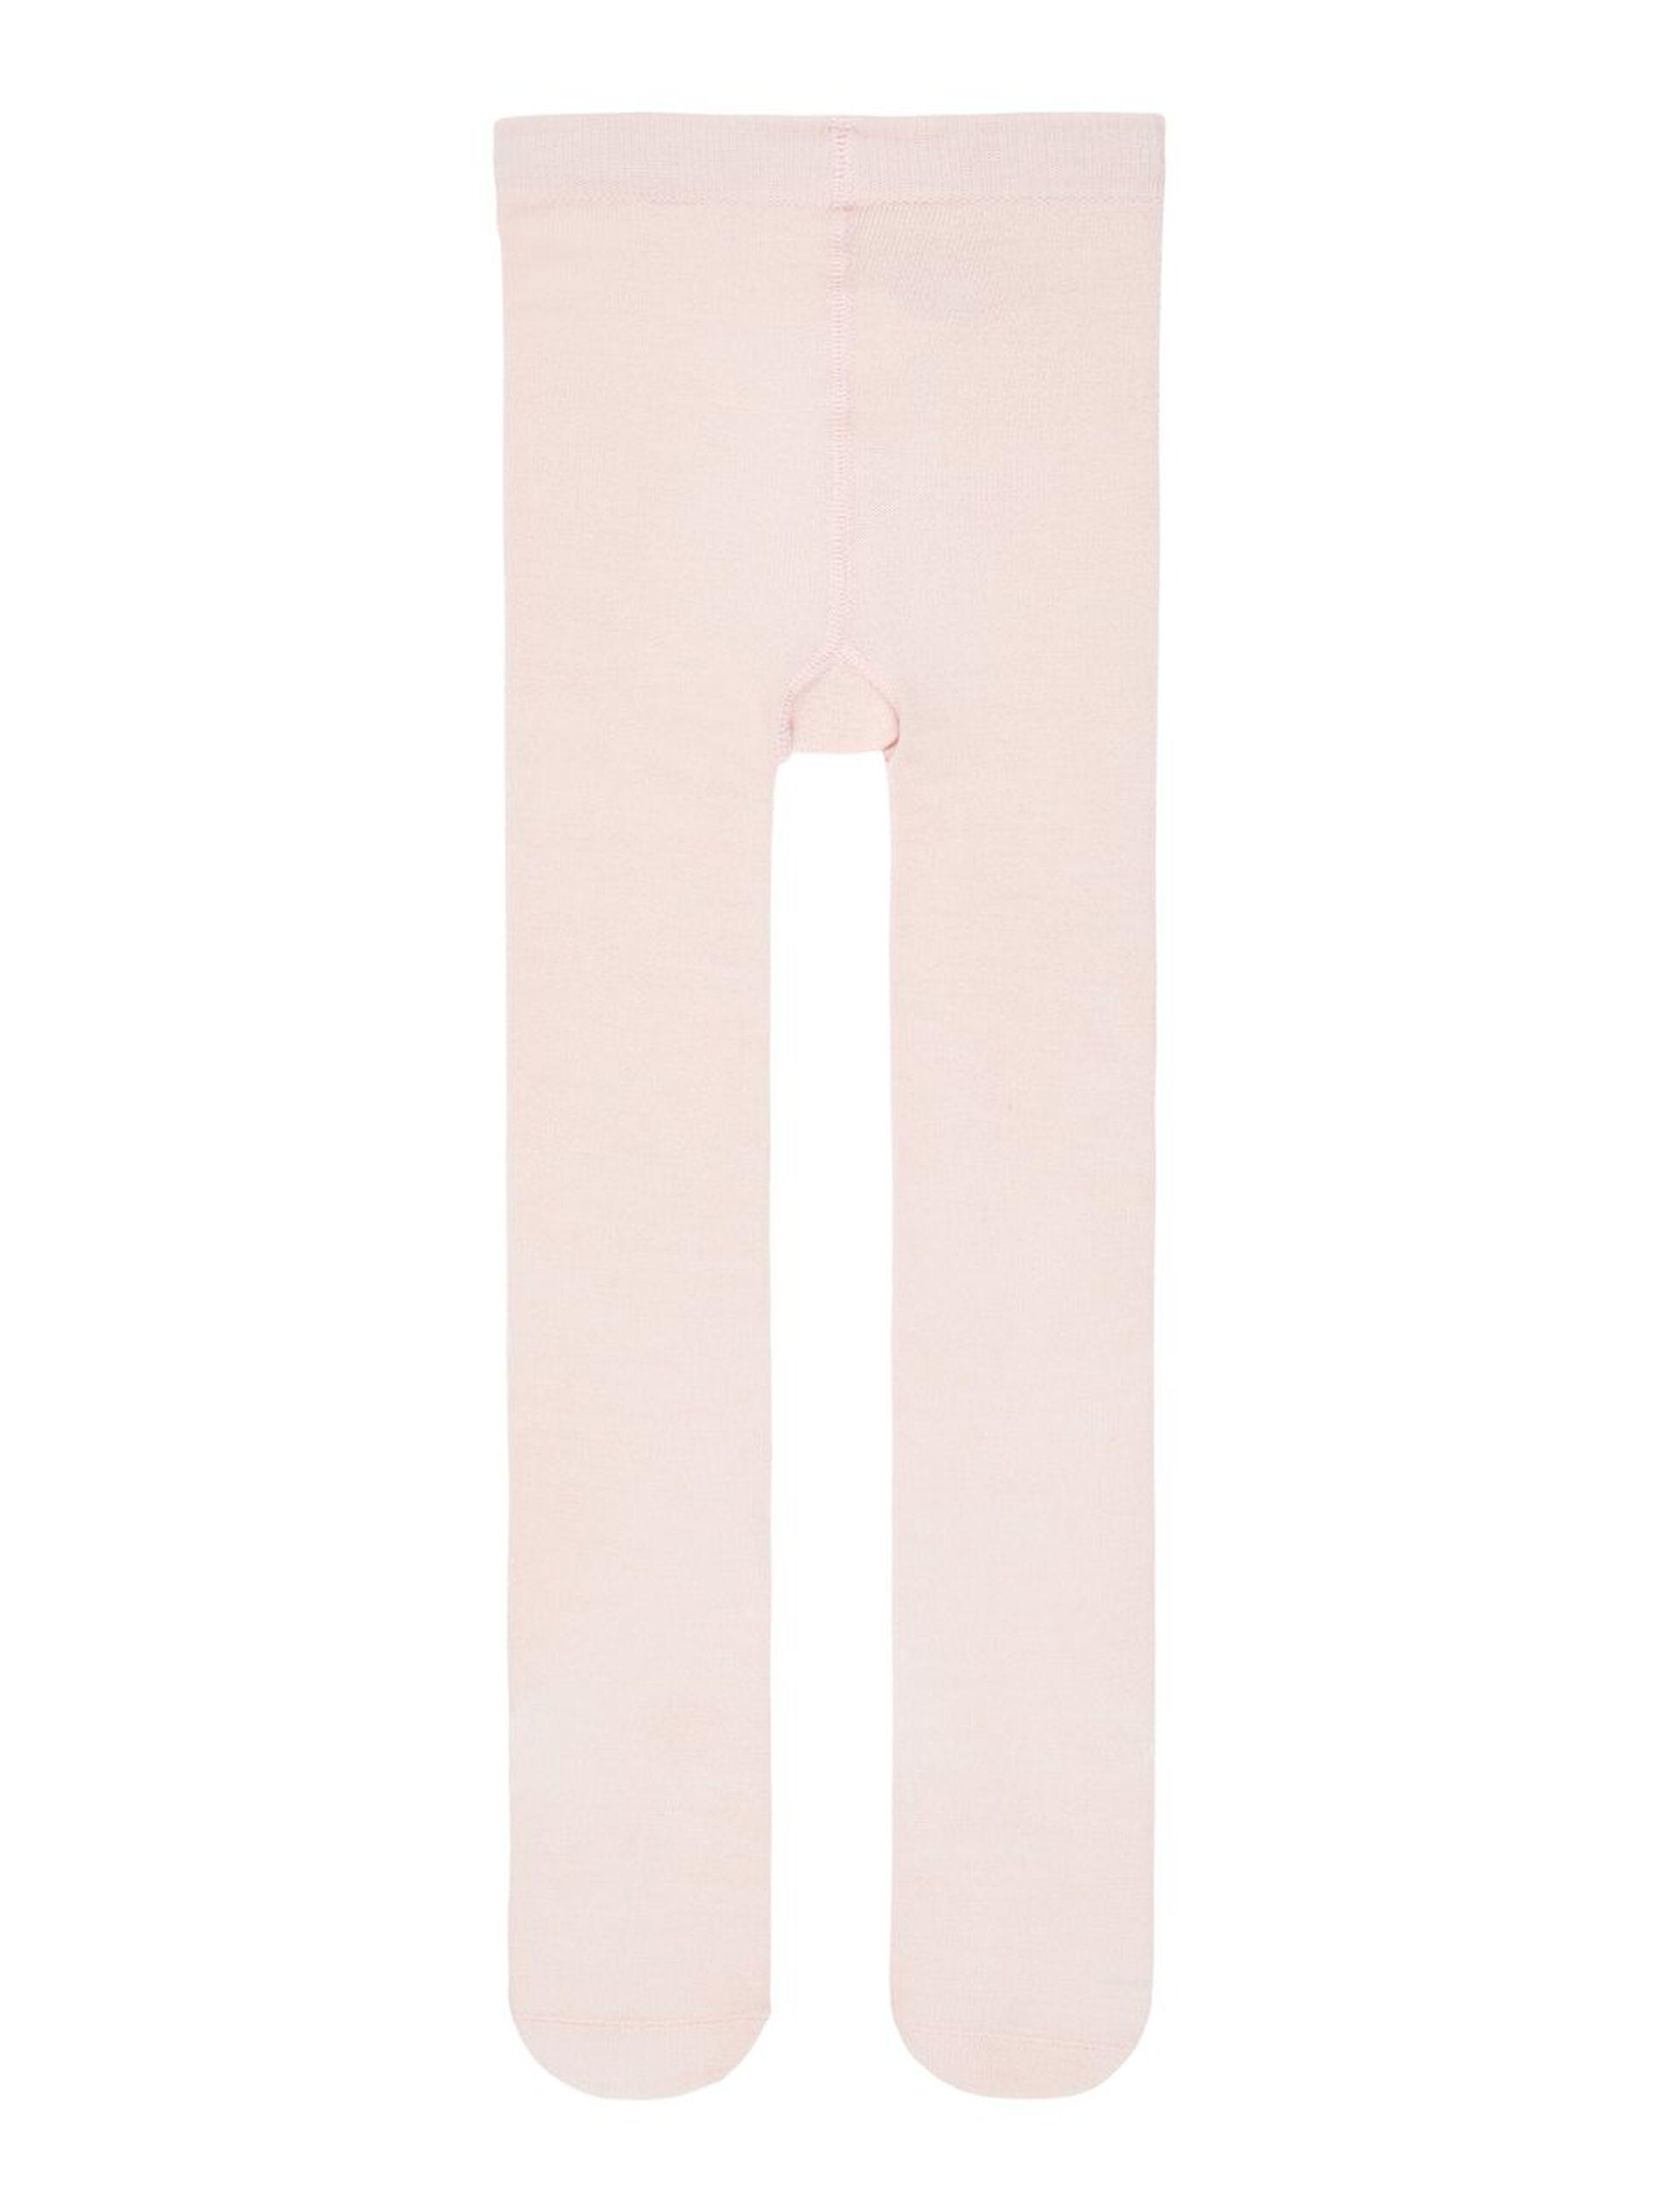 Rosa strømpebukse ull – Ull lys rosa strømpebukse ull – Mio Trend